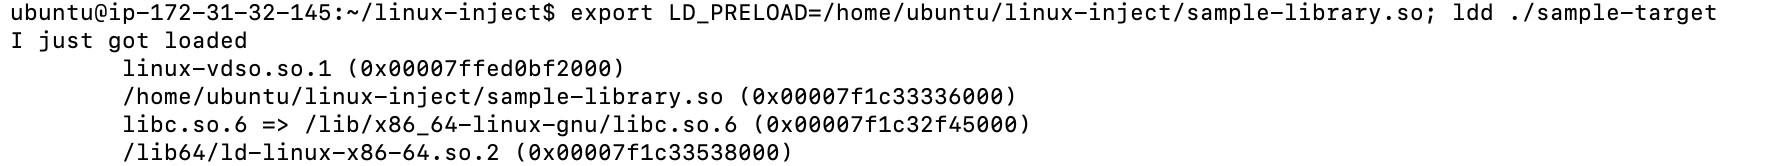 Ubuntu executing LD_PRELOAD